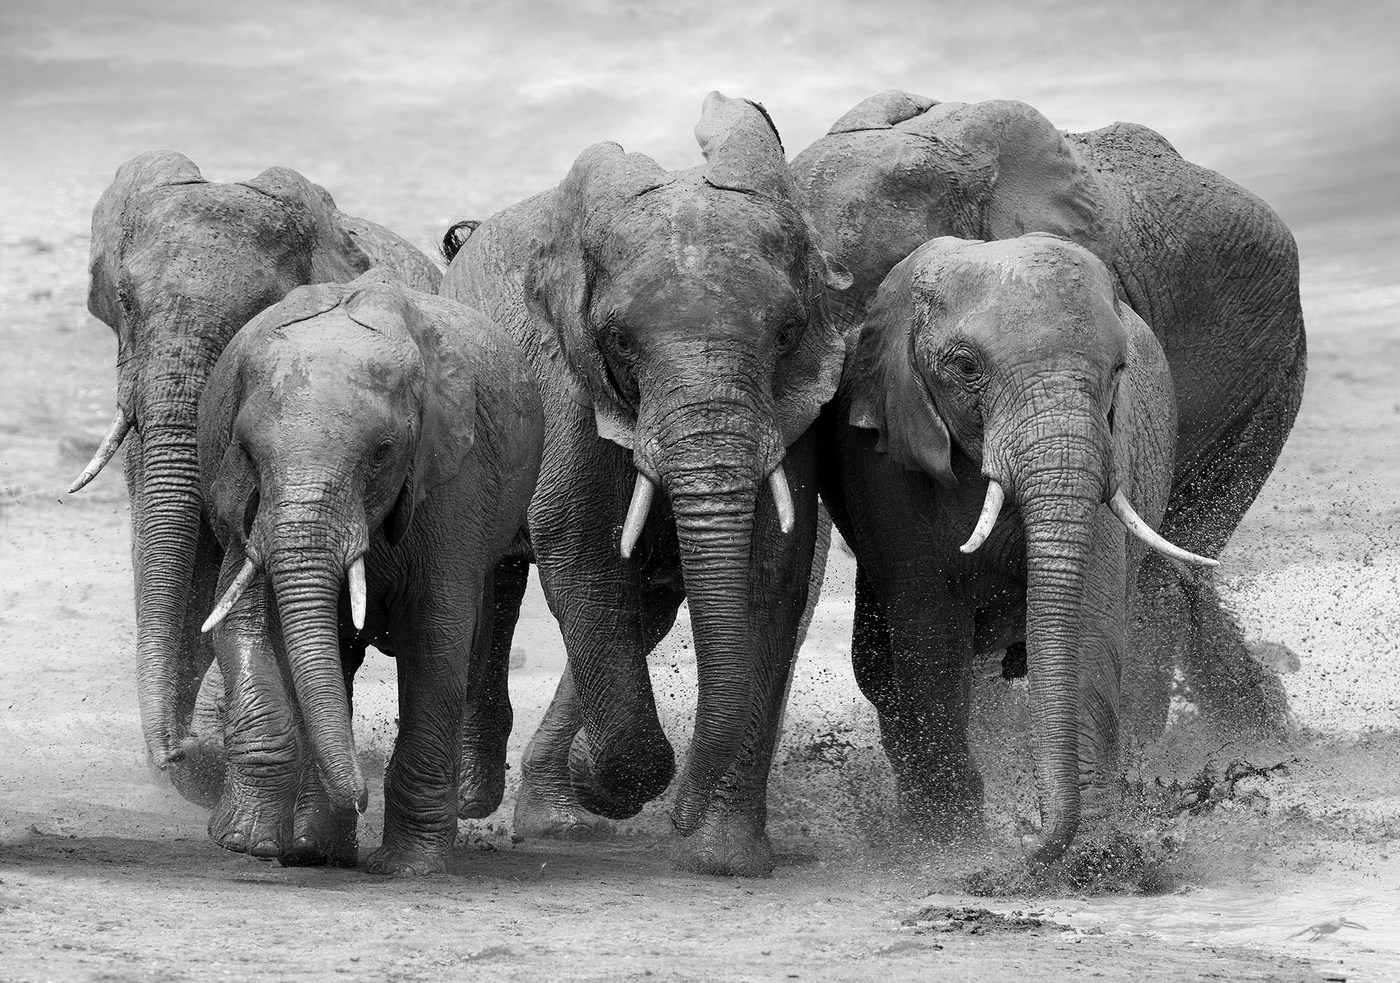 Vlies Fototapete 4578 Natur Tapete Tier Elefant Afrika Natur Herde Schwarz Weiß